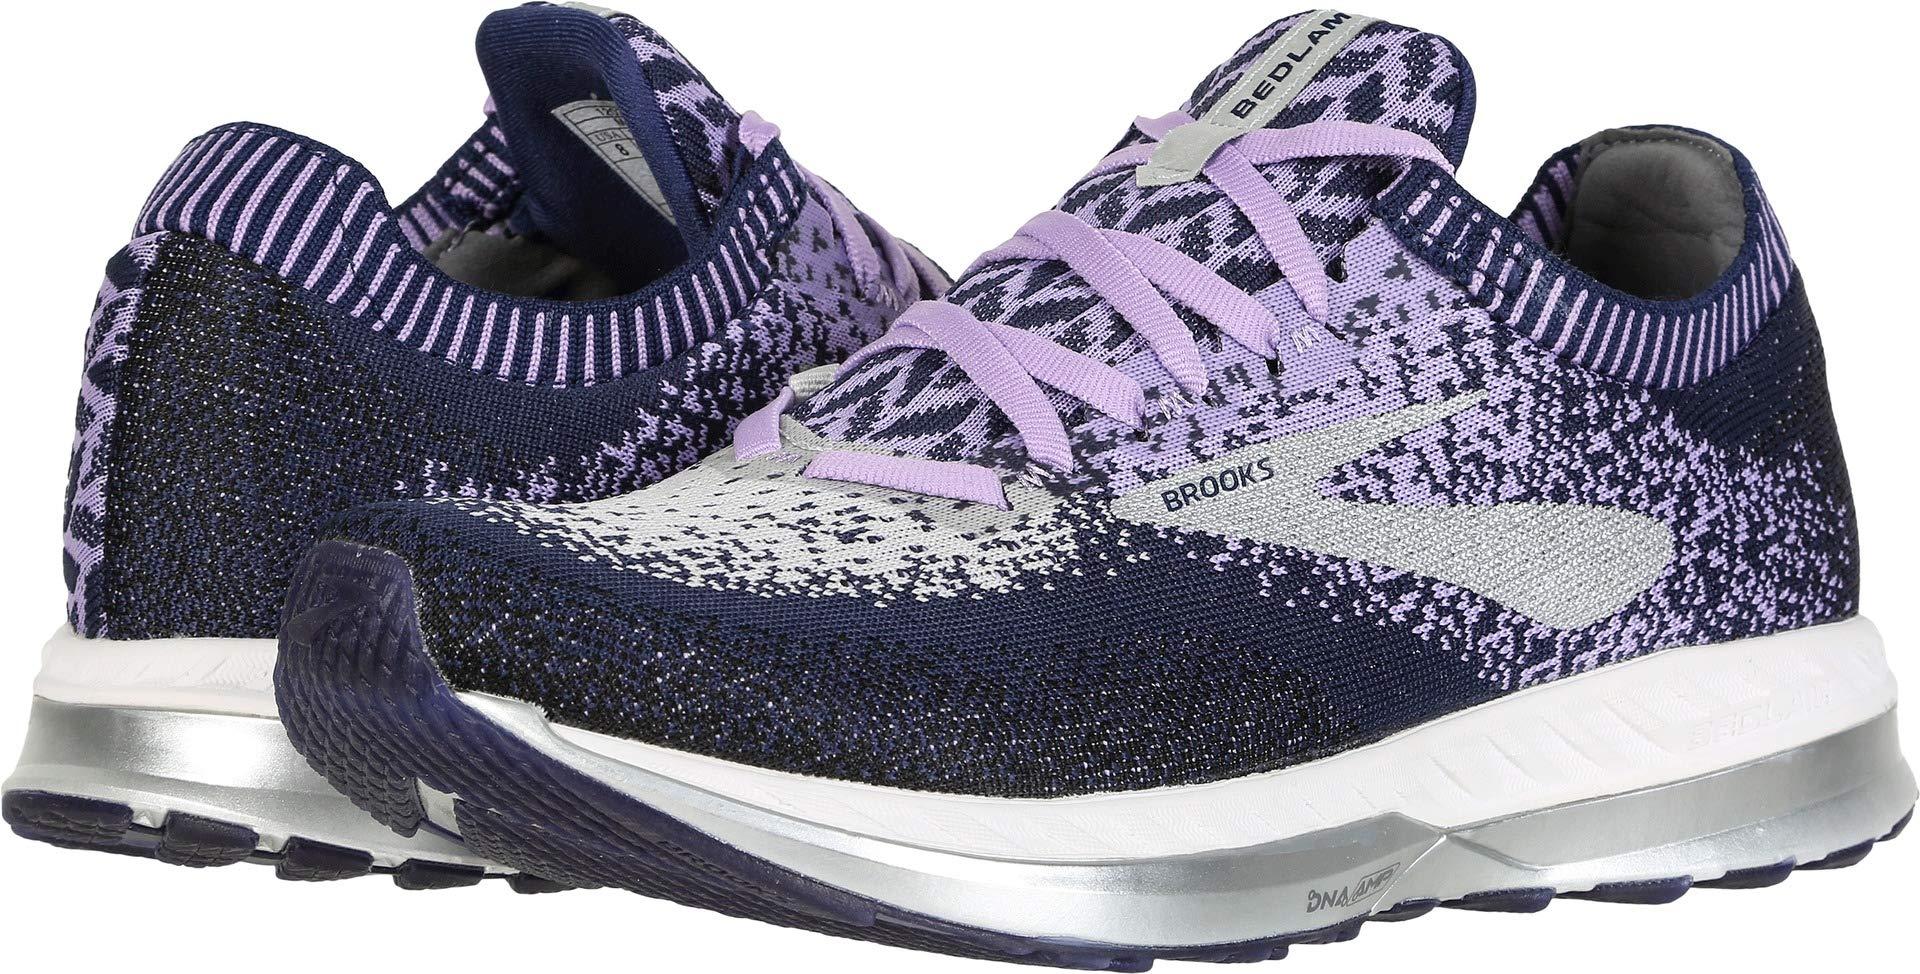 Brooks Women's Bedlam Purple/Navy/Grey 6 B US